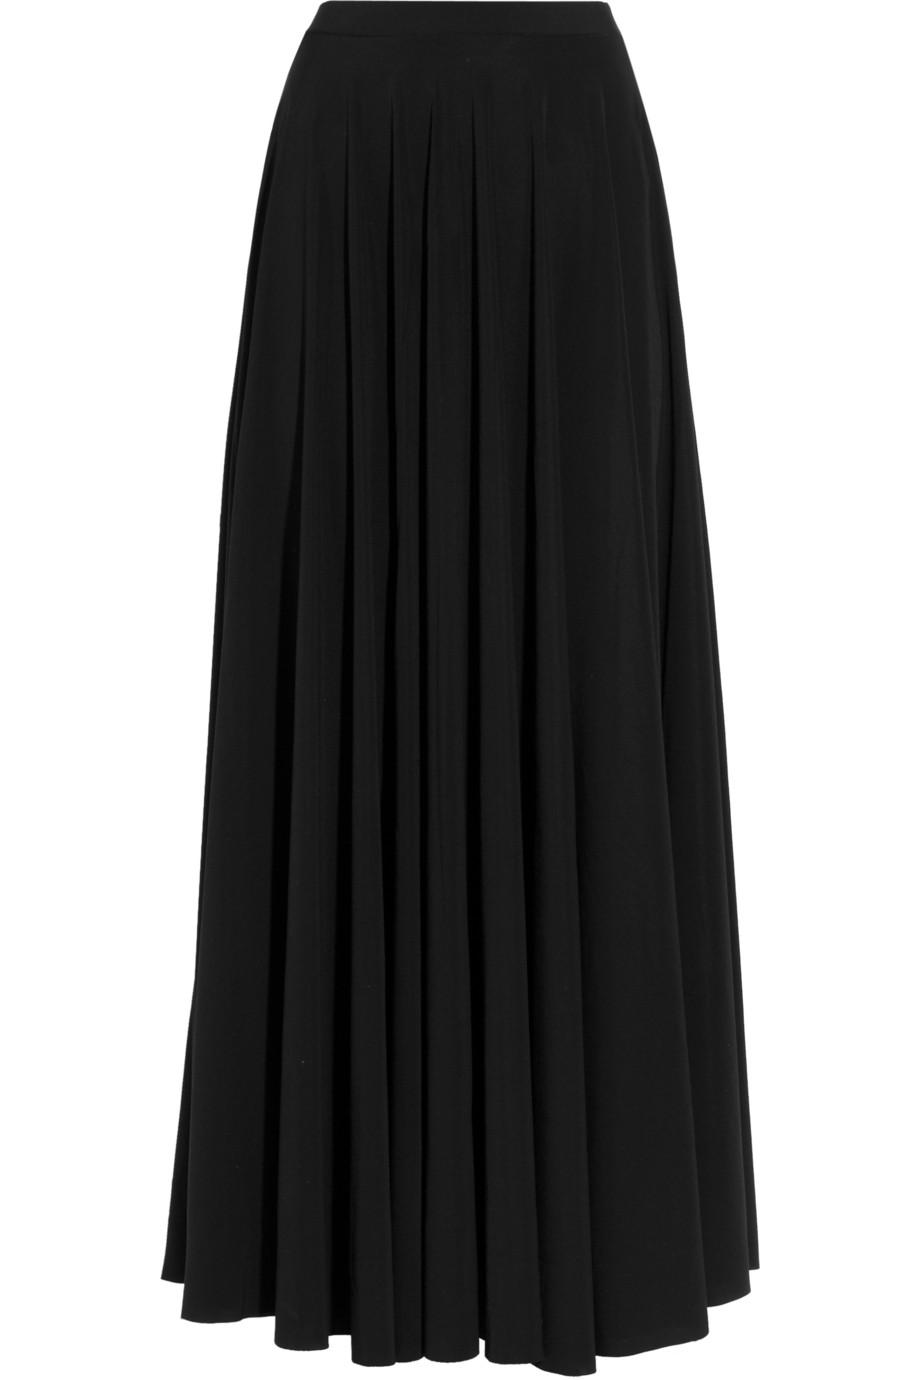 lanvin side split maxi skirt in black lyst